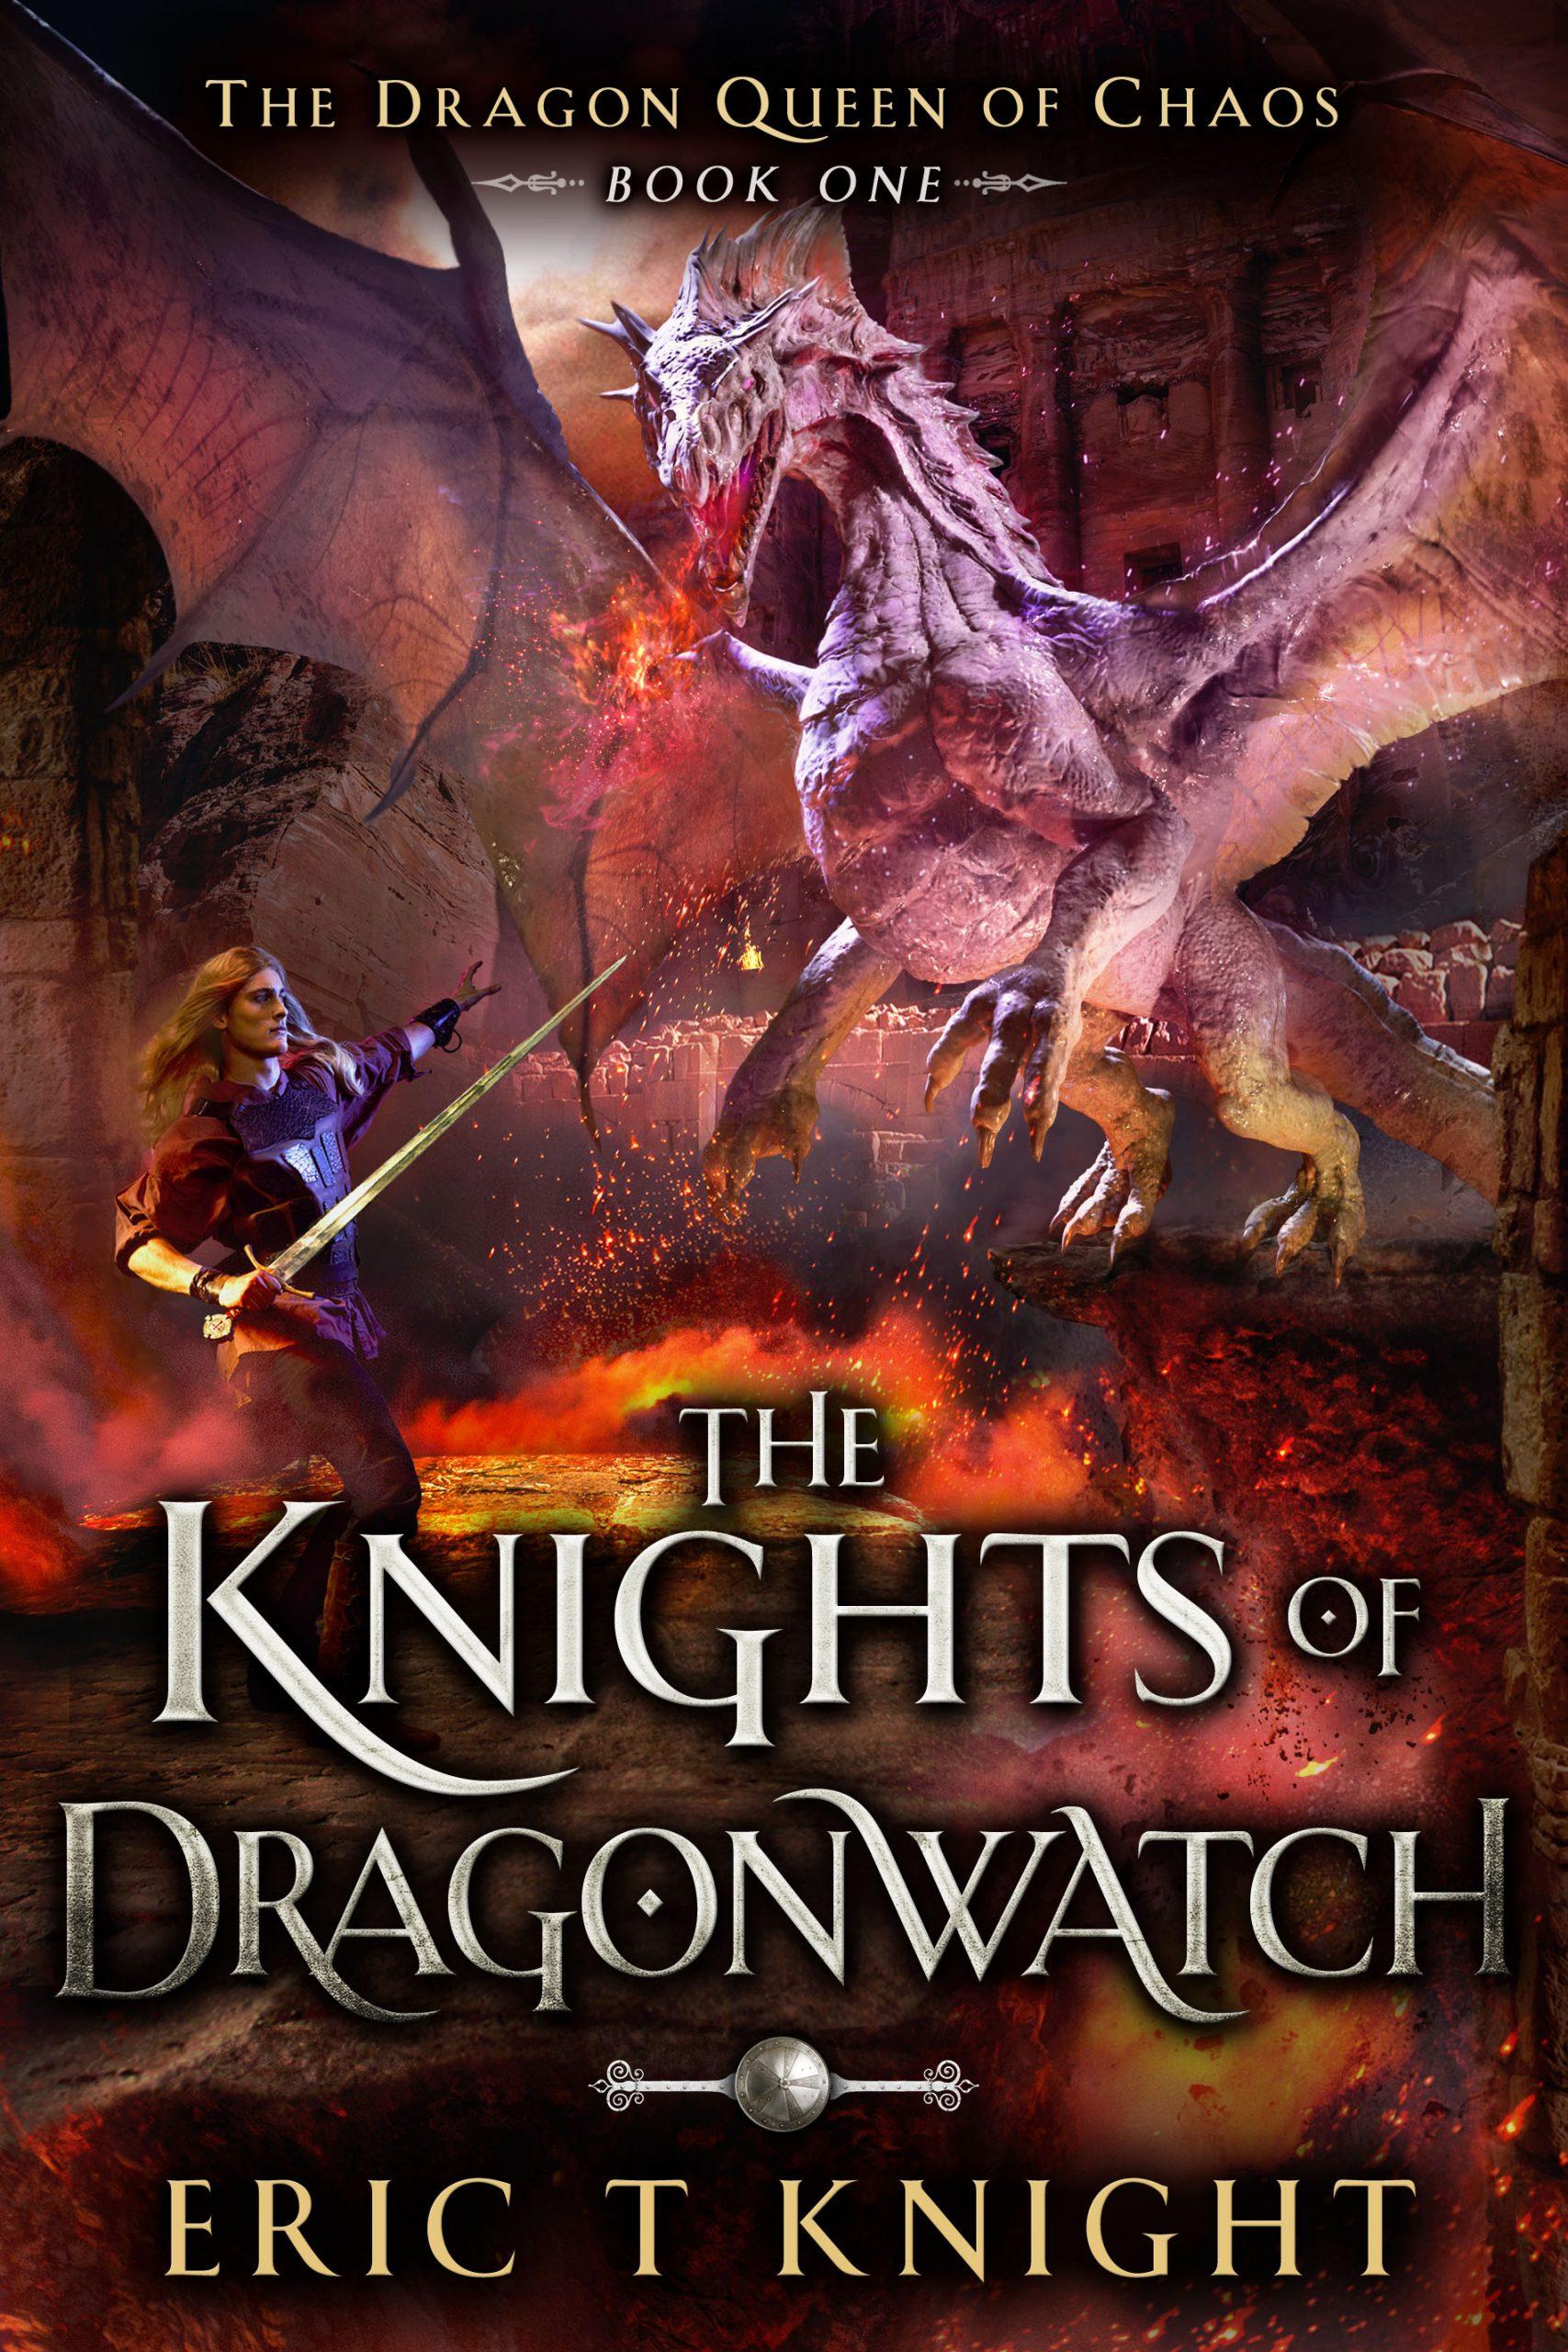 KnightsofDragonwatch (1)